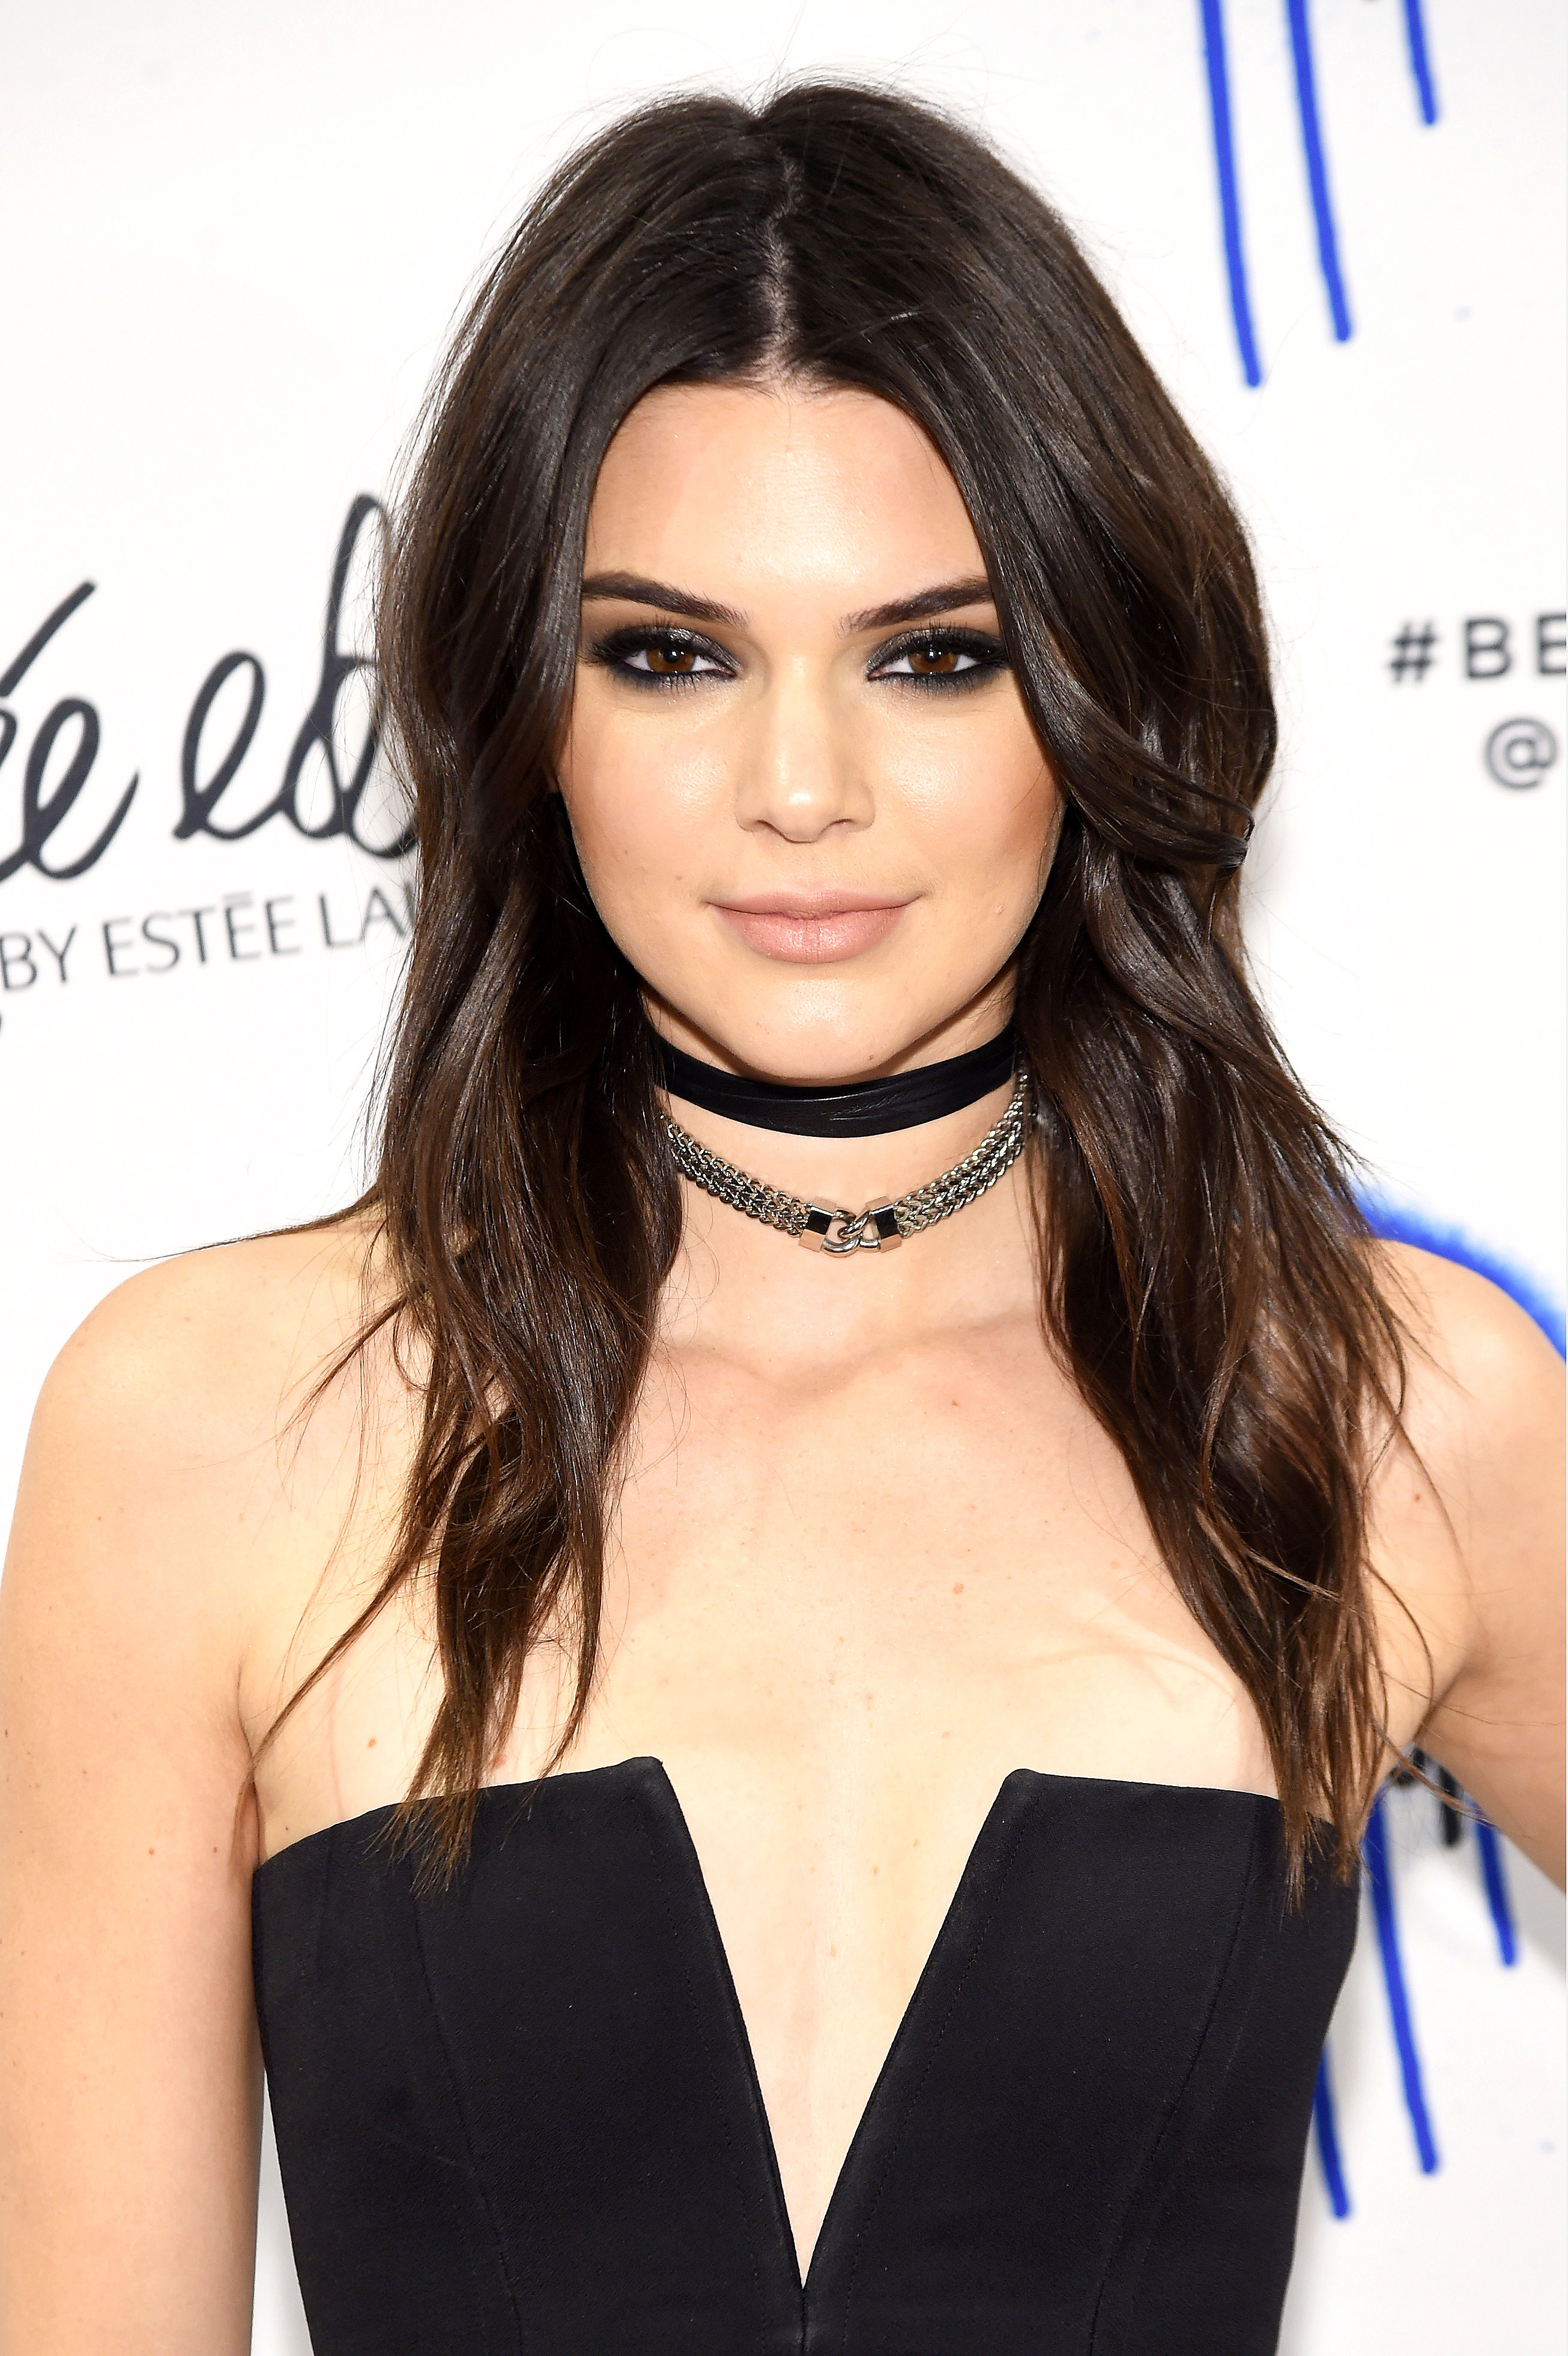 Kendall Jenner Credits Christy Turlington As Her Lob Inspiration